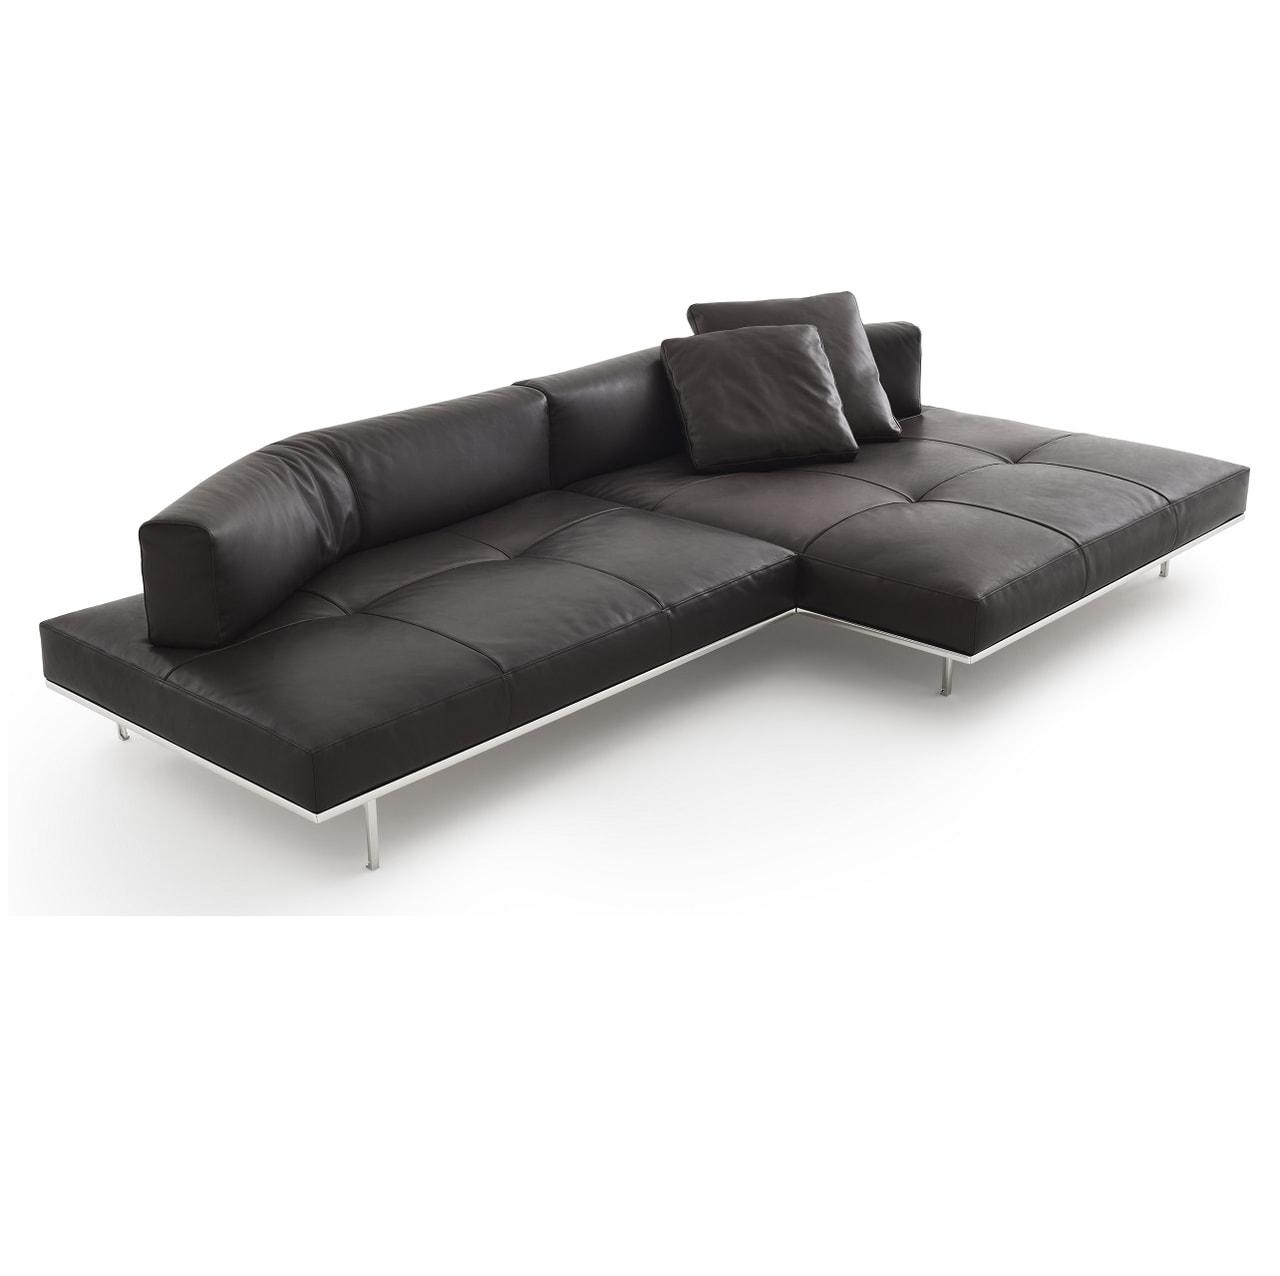 Piero Lissoni Collection Matic Sofa System